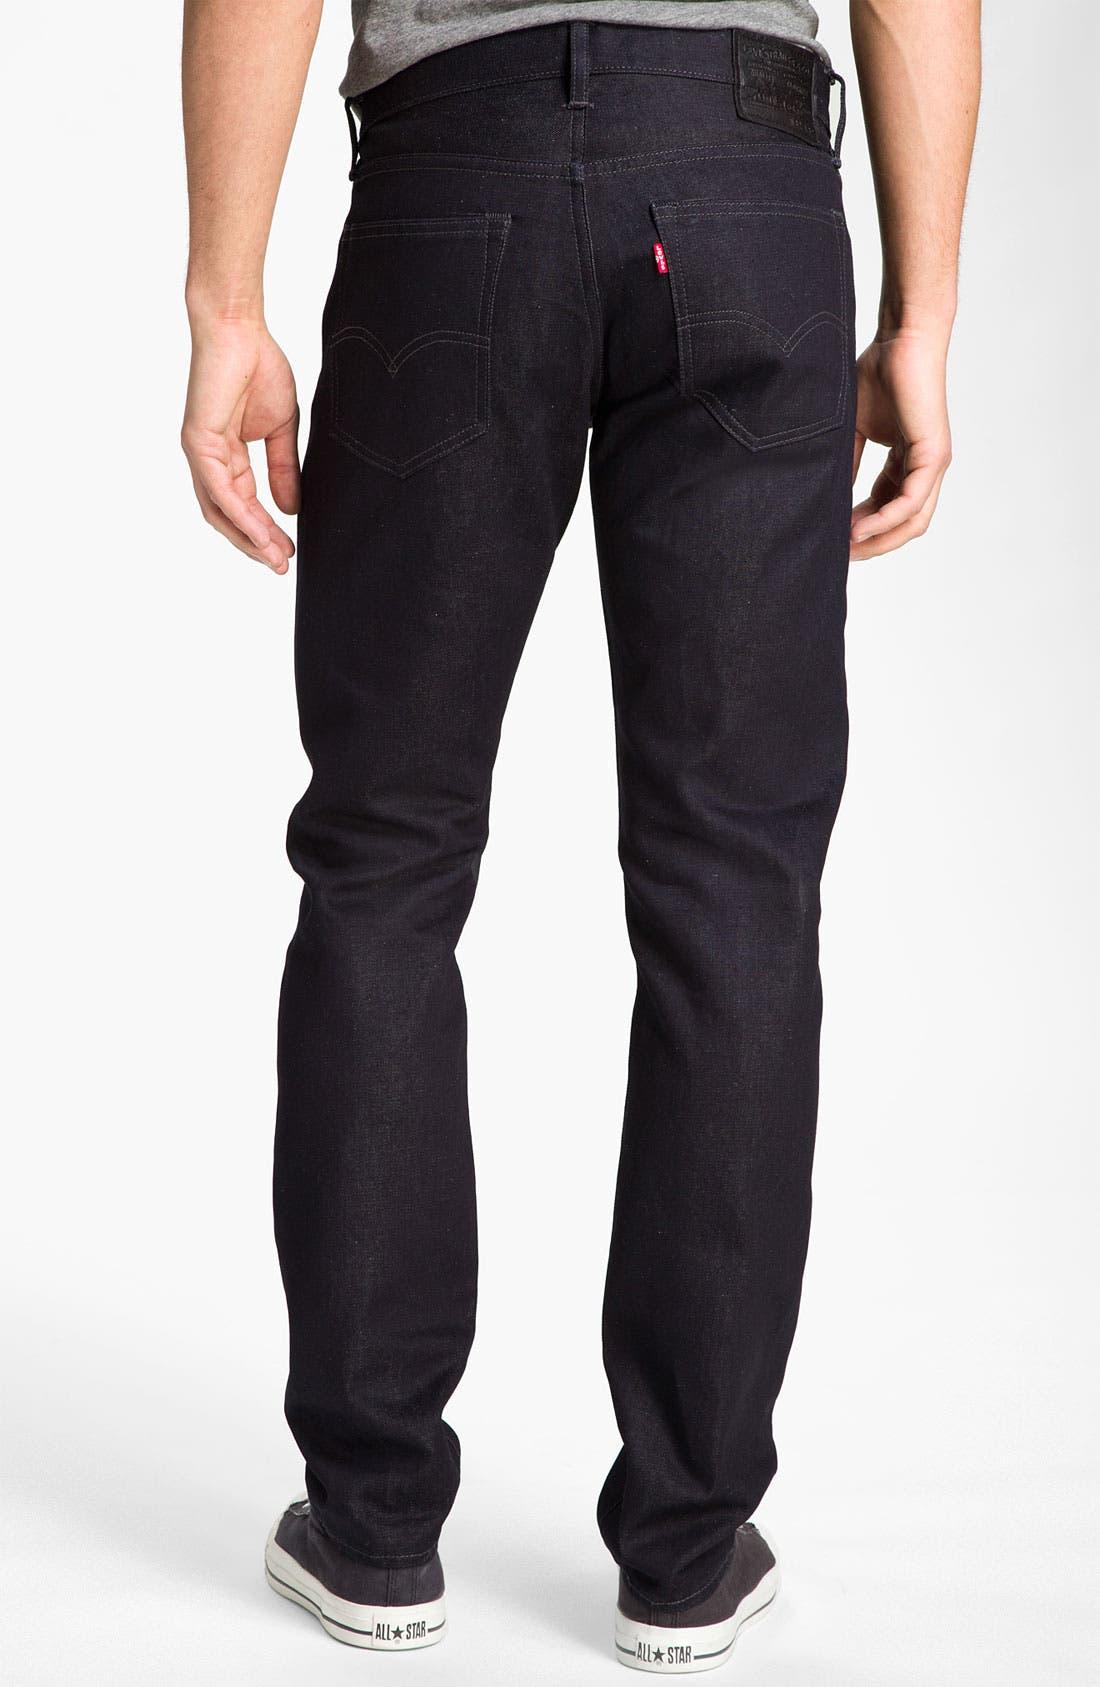 Main Image - Levi's® 'Matchstick' Slim Straight Leg Jeans (Mayfield)